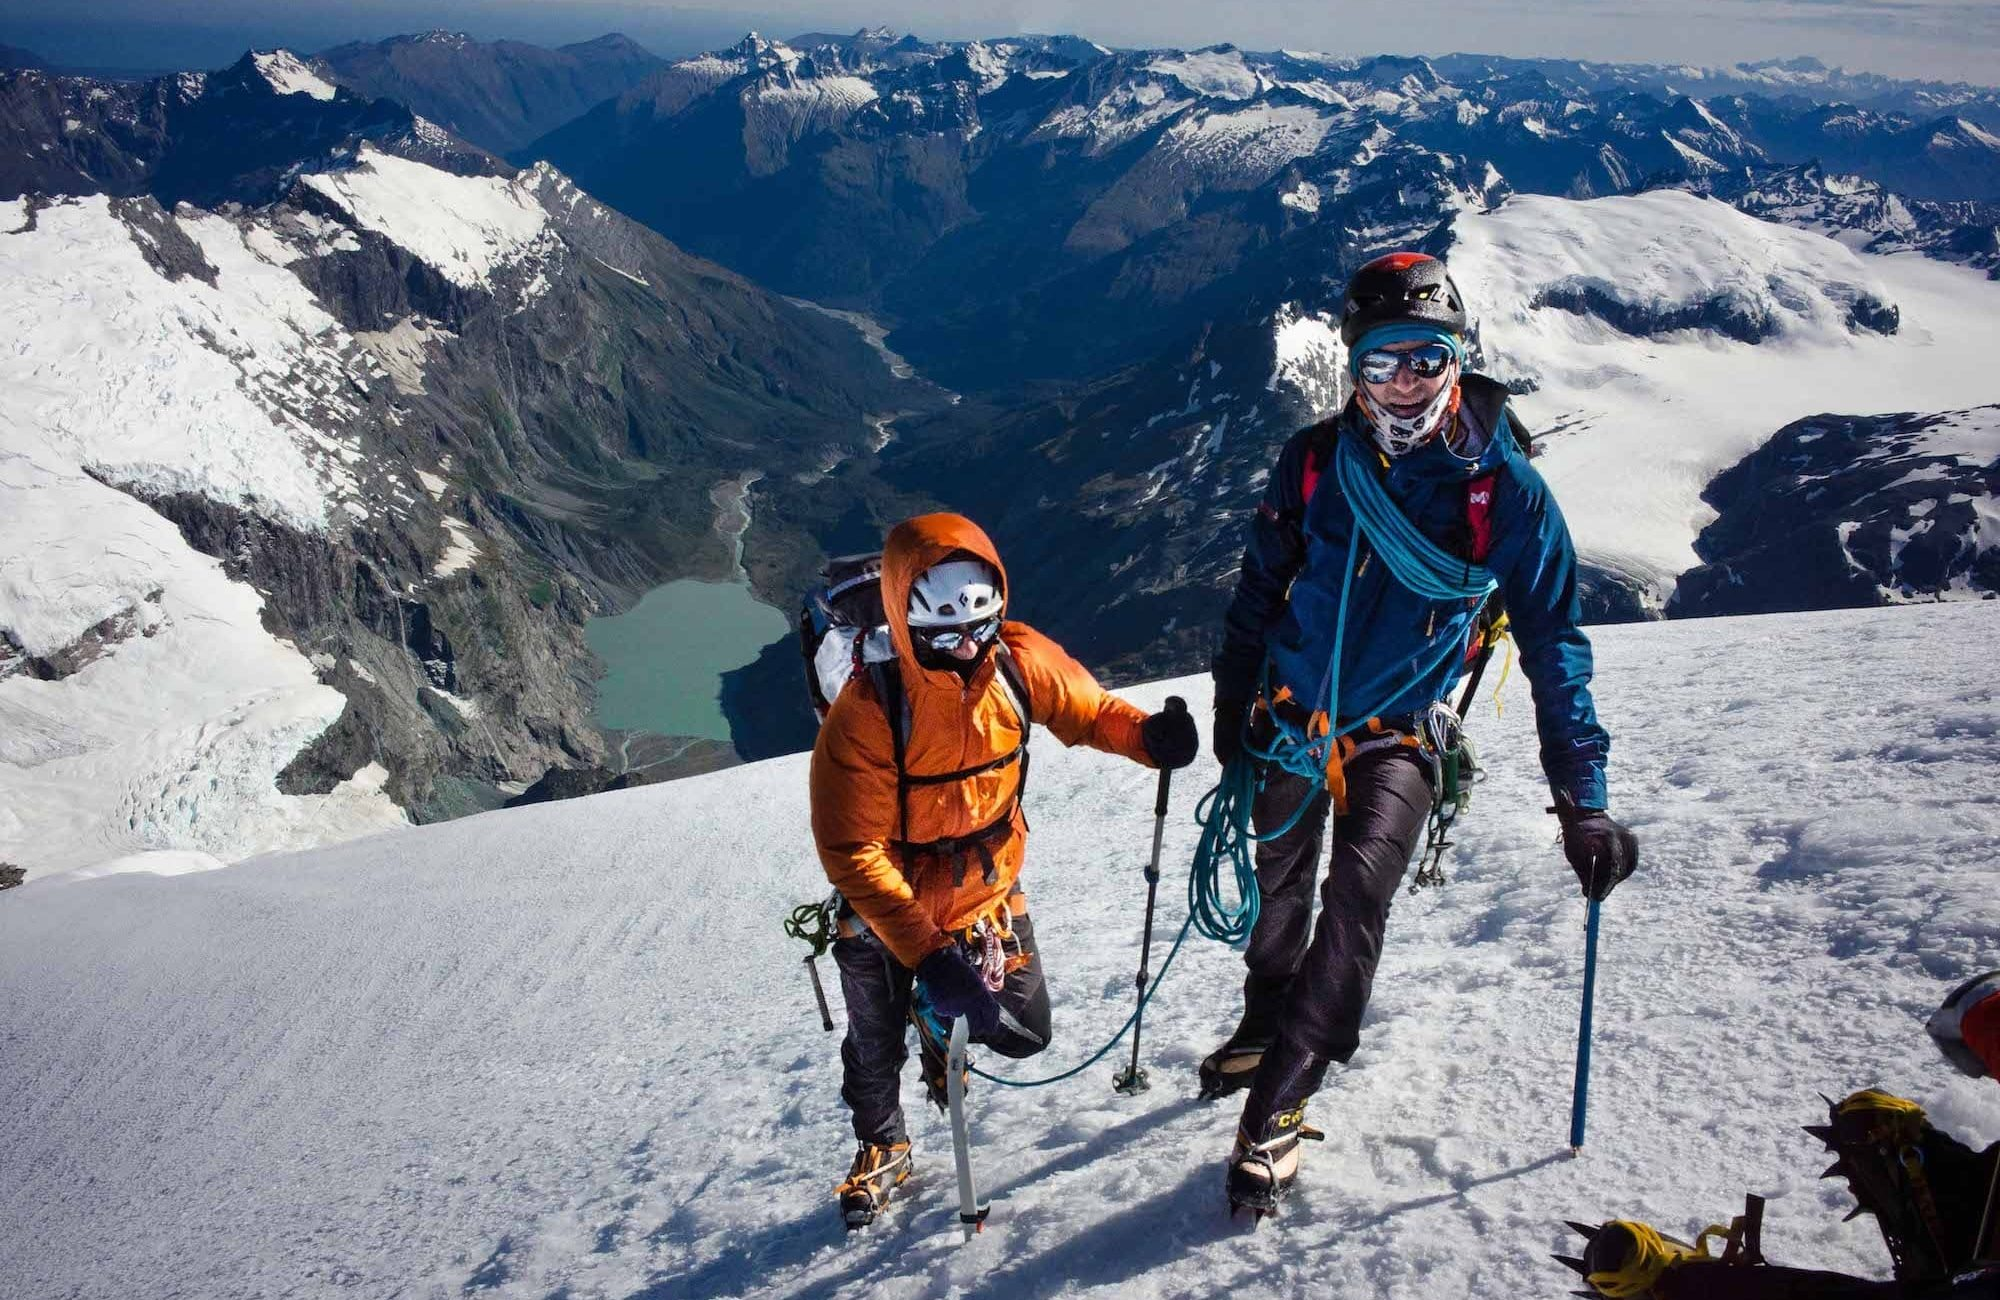 Mountain climbing with crampons on Mount Aspiring, NZ